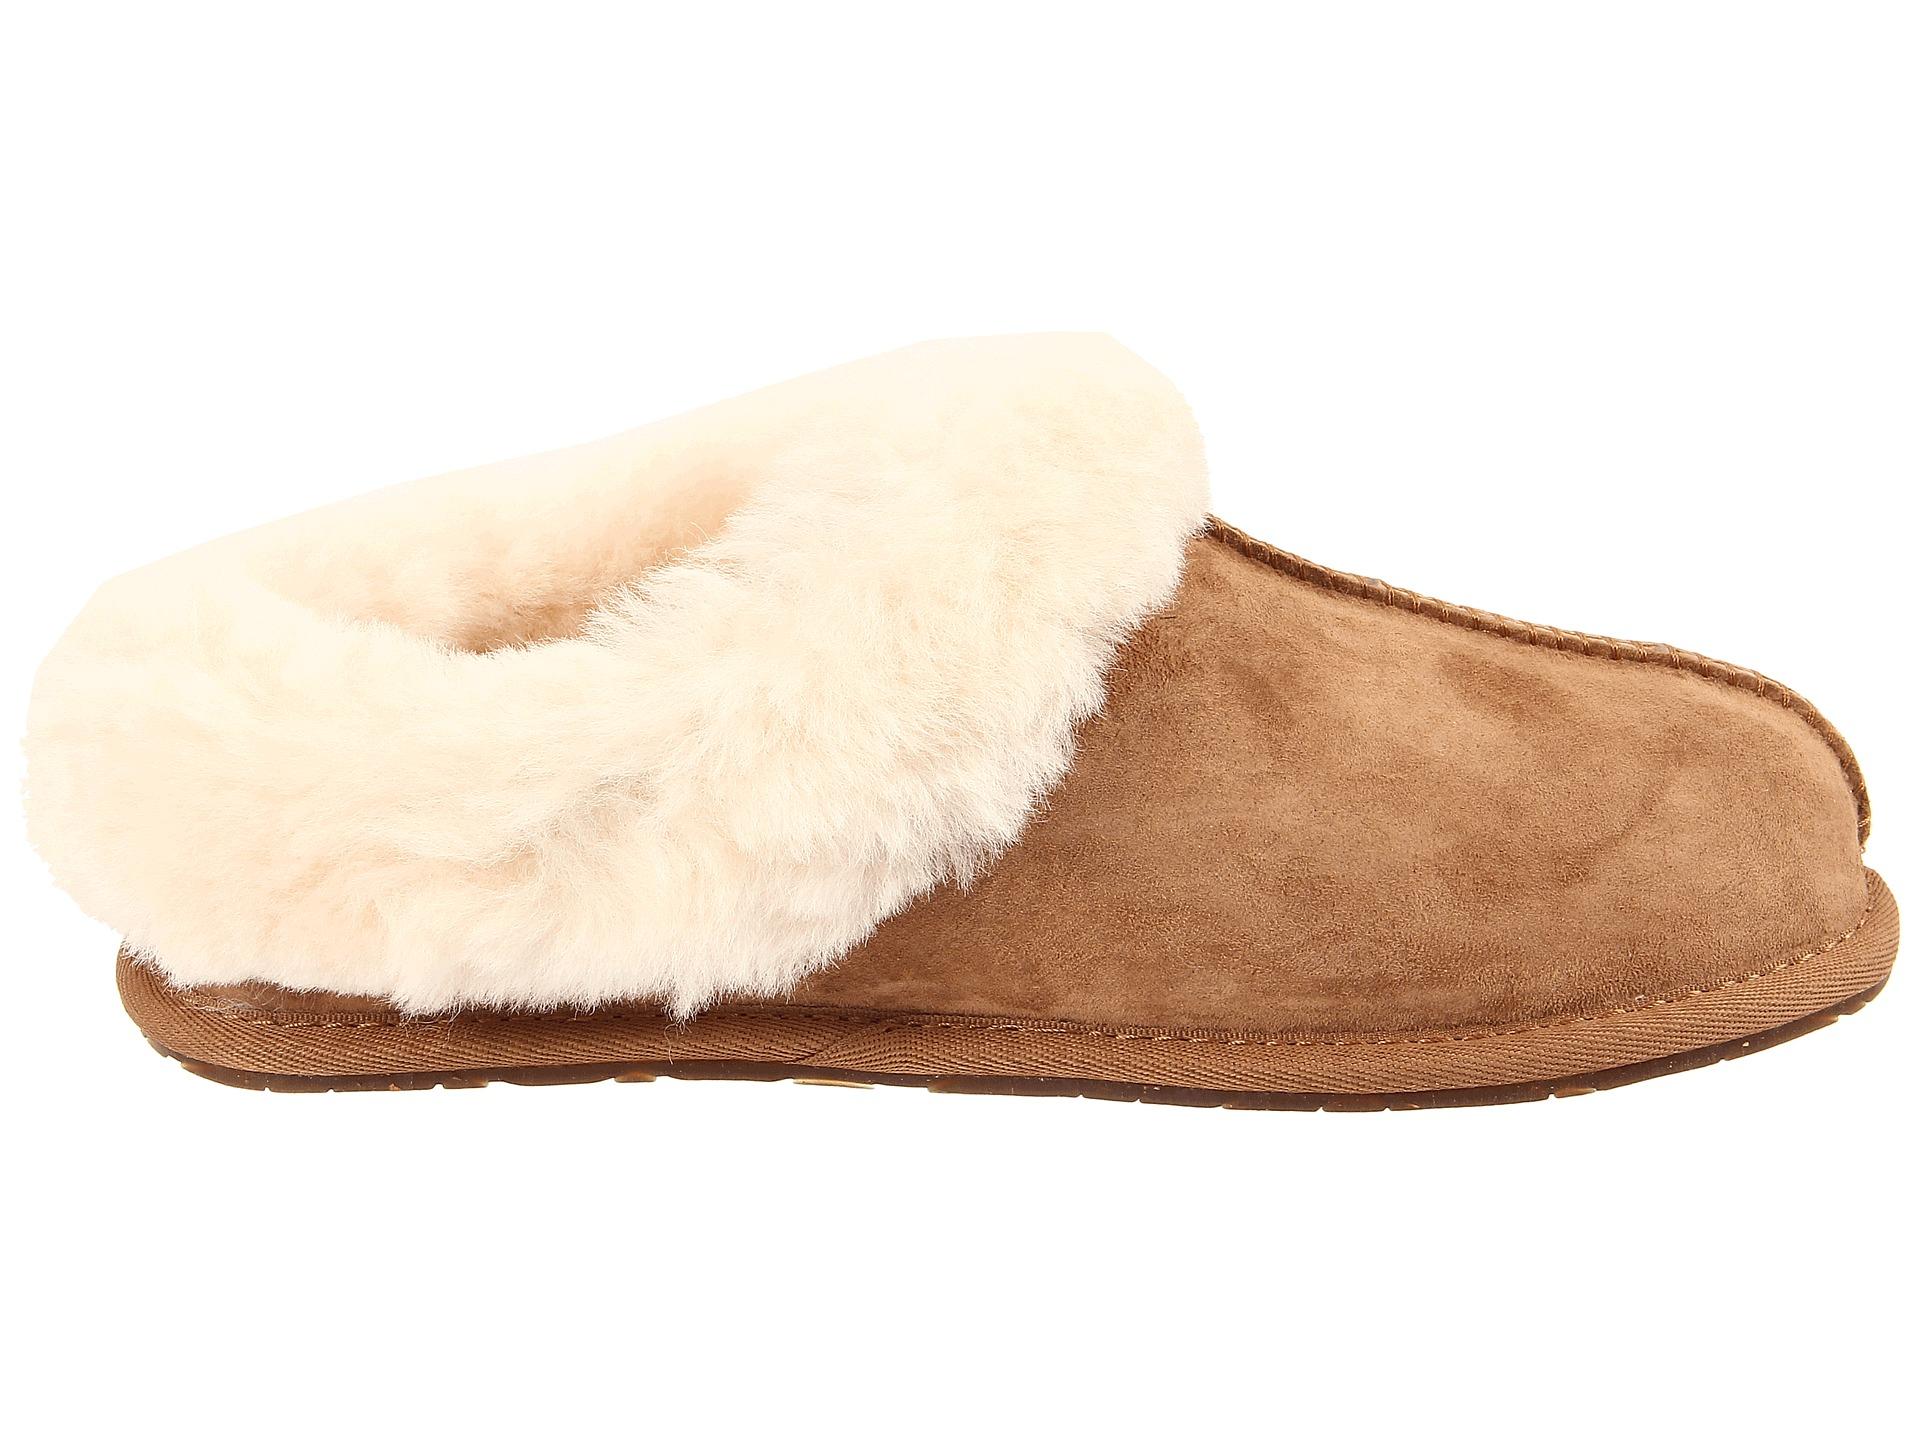 41233f8aaa7459 Zappos uggs sandals mit hillel jpg 1920x1440 Rutgers slippers